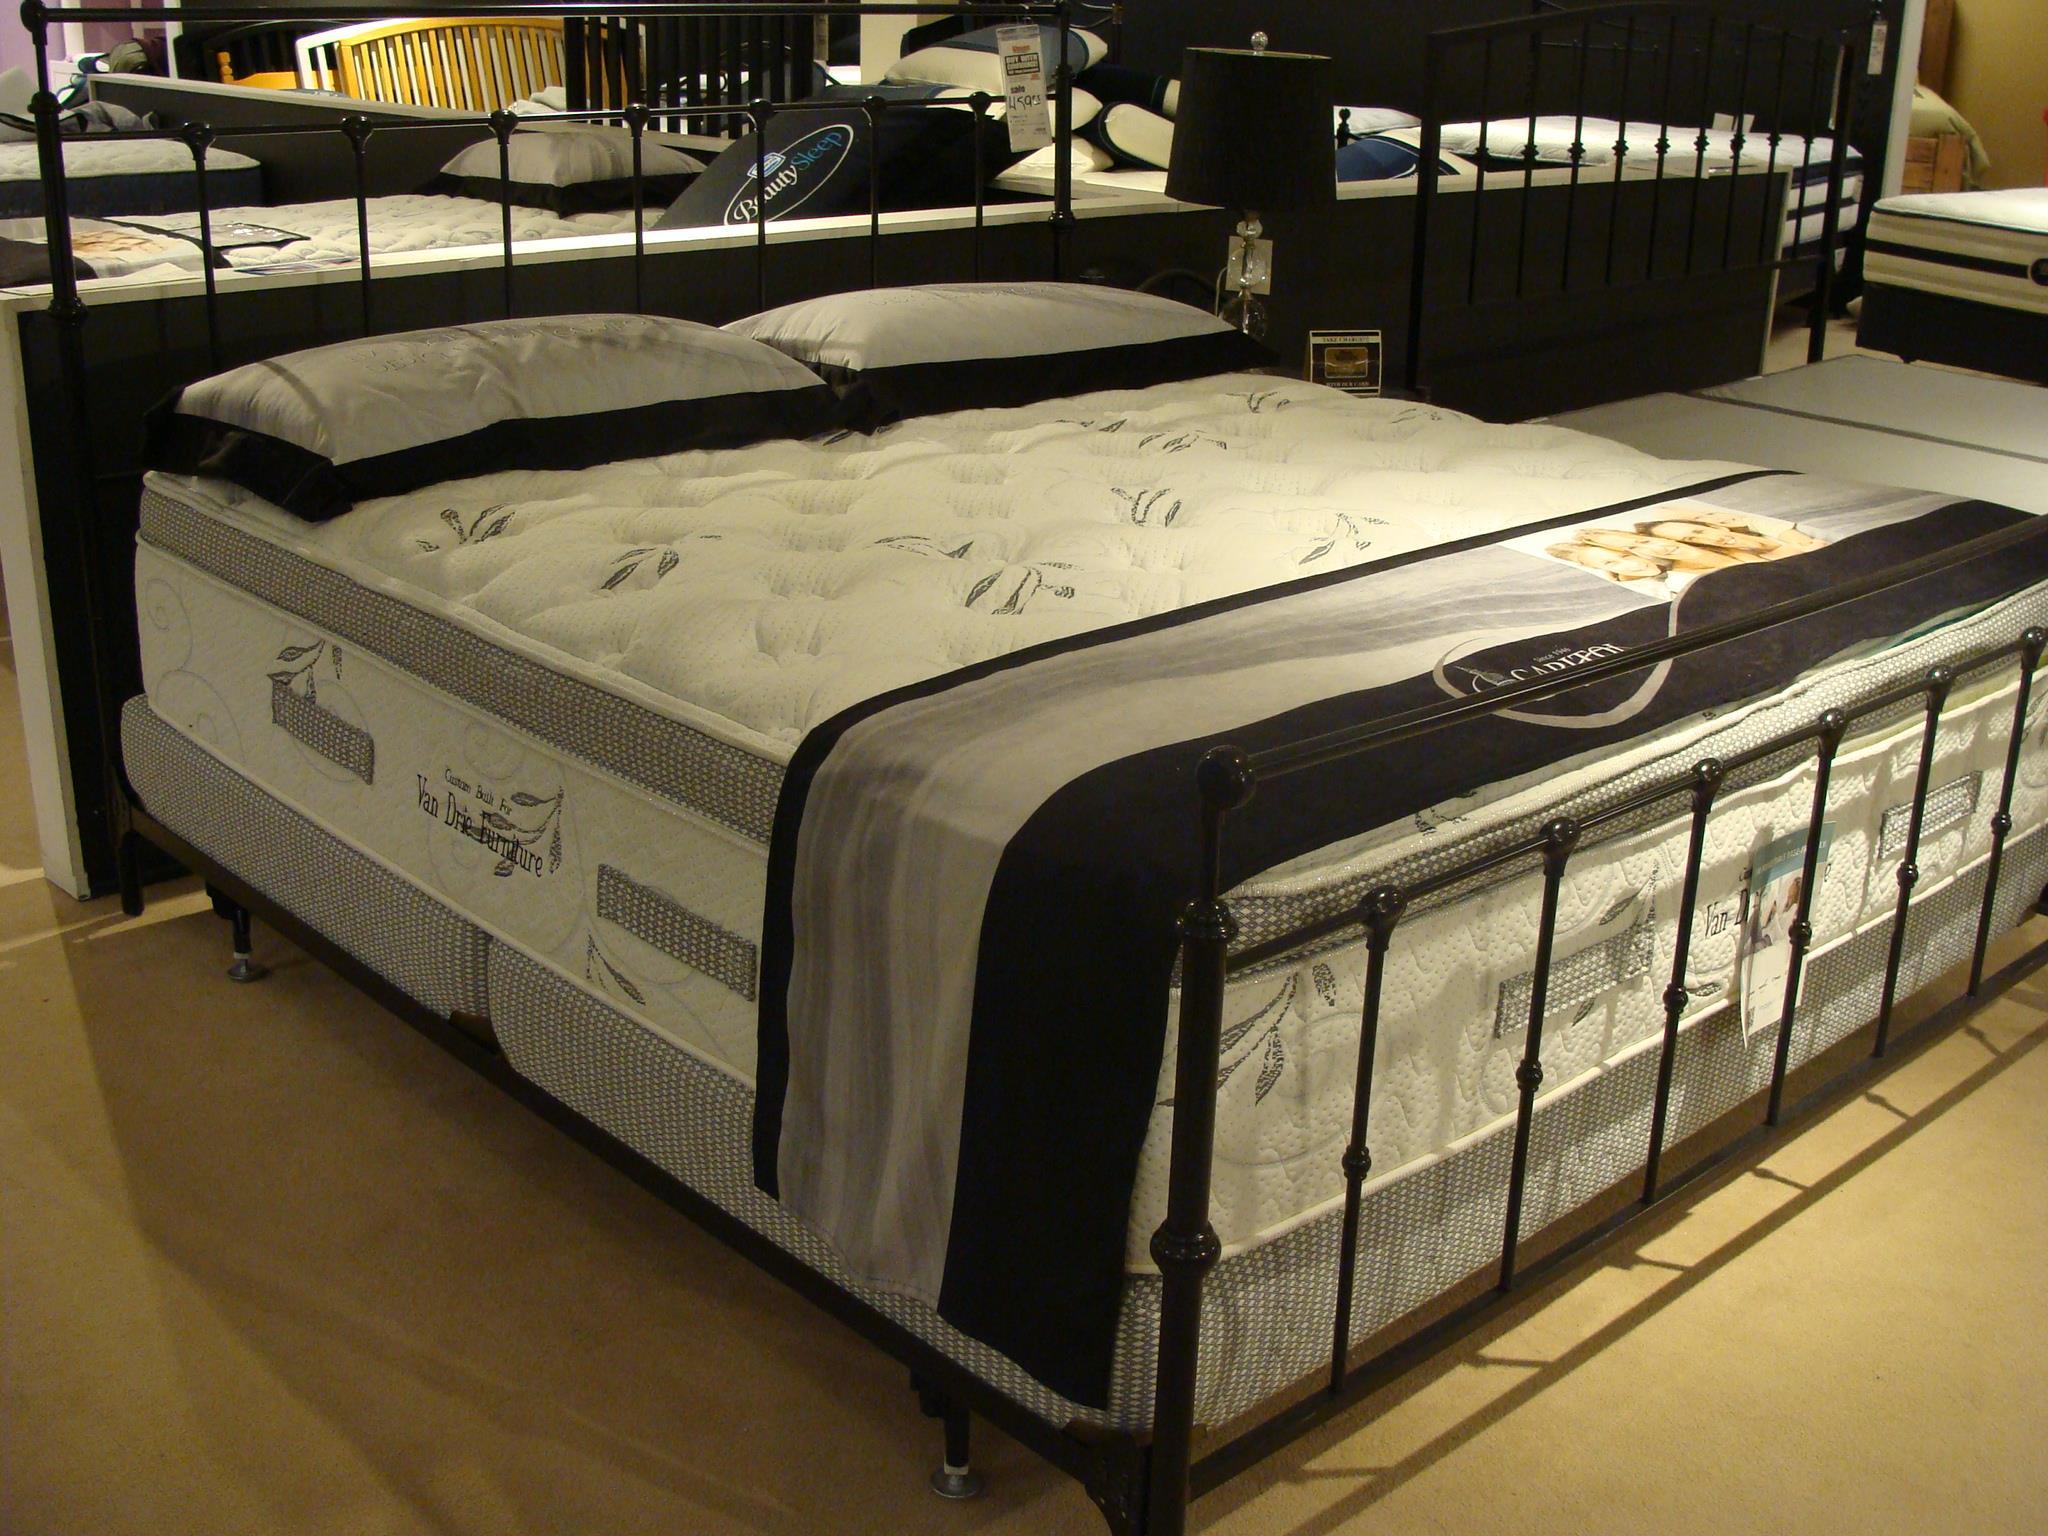 Capitol Bedding Opulence Twin Pillow Top Mattress Set - Item Number: PillowTop-T+HMI-T